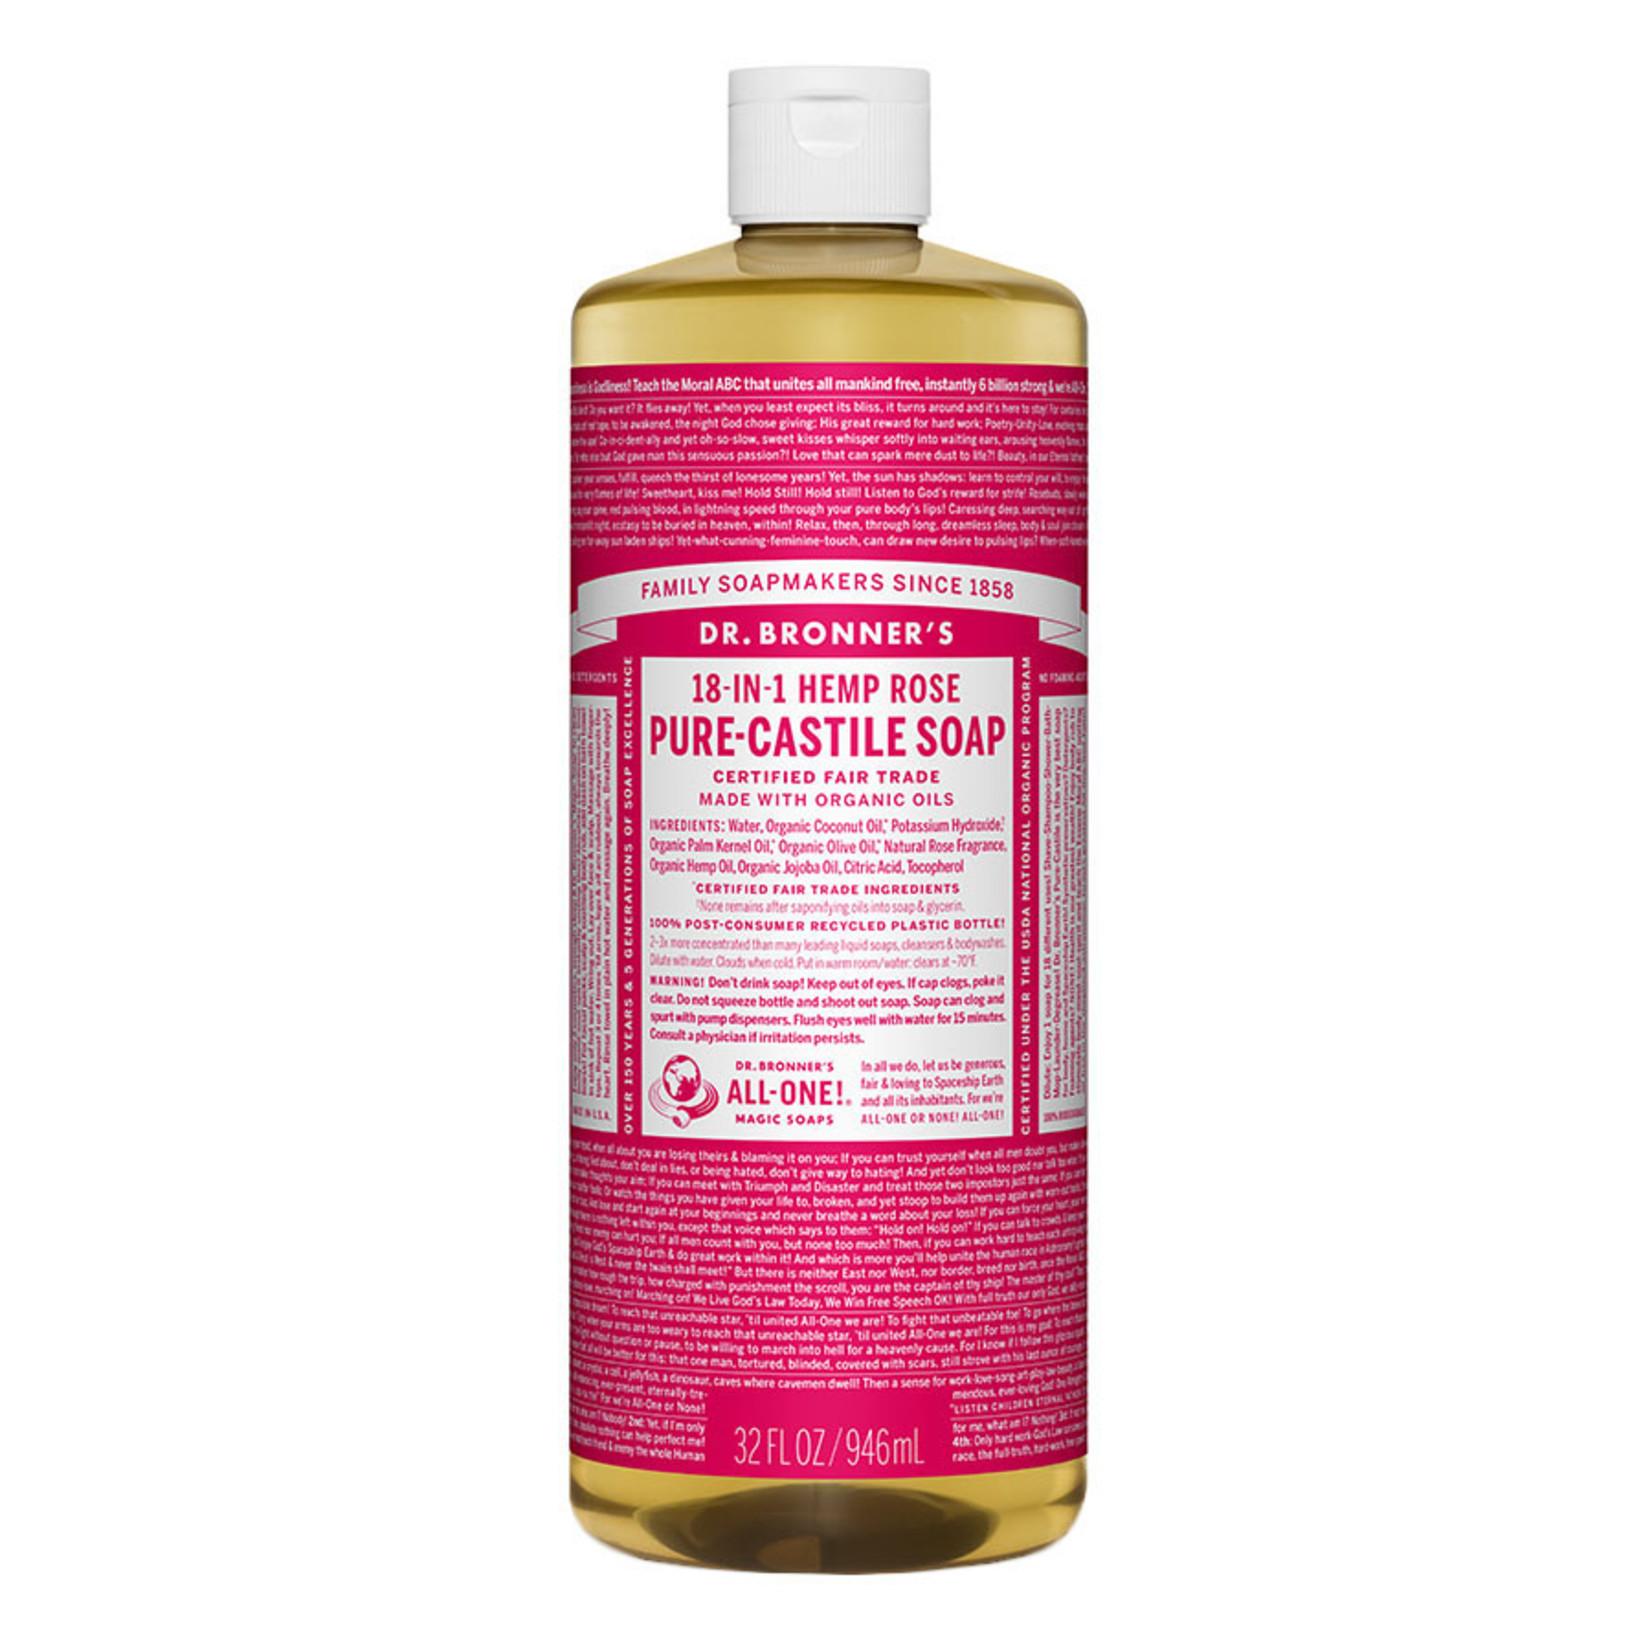 Dr. Bronner's 18-in-1 Pure-Castile Liquid Soap